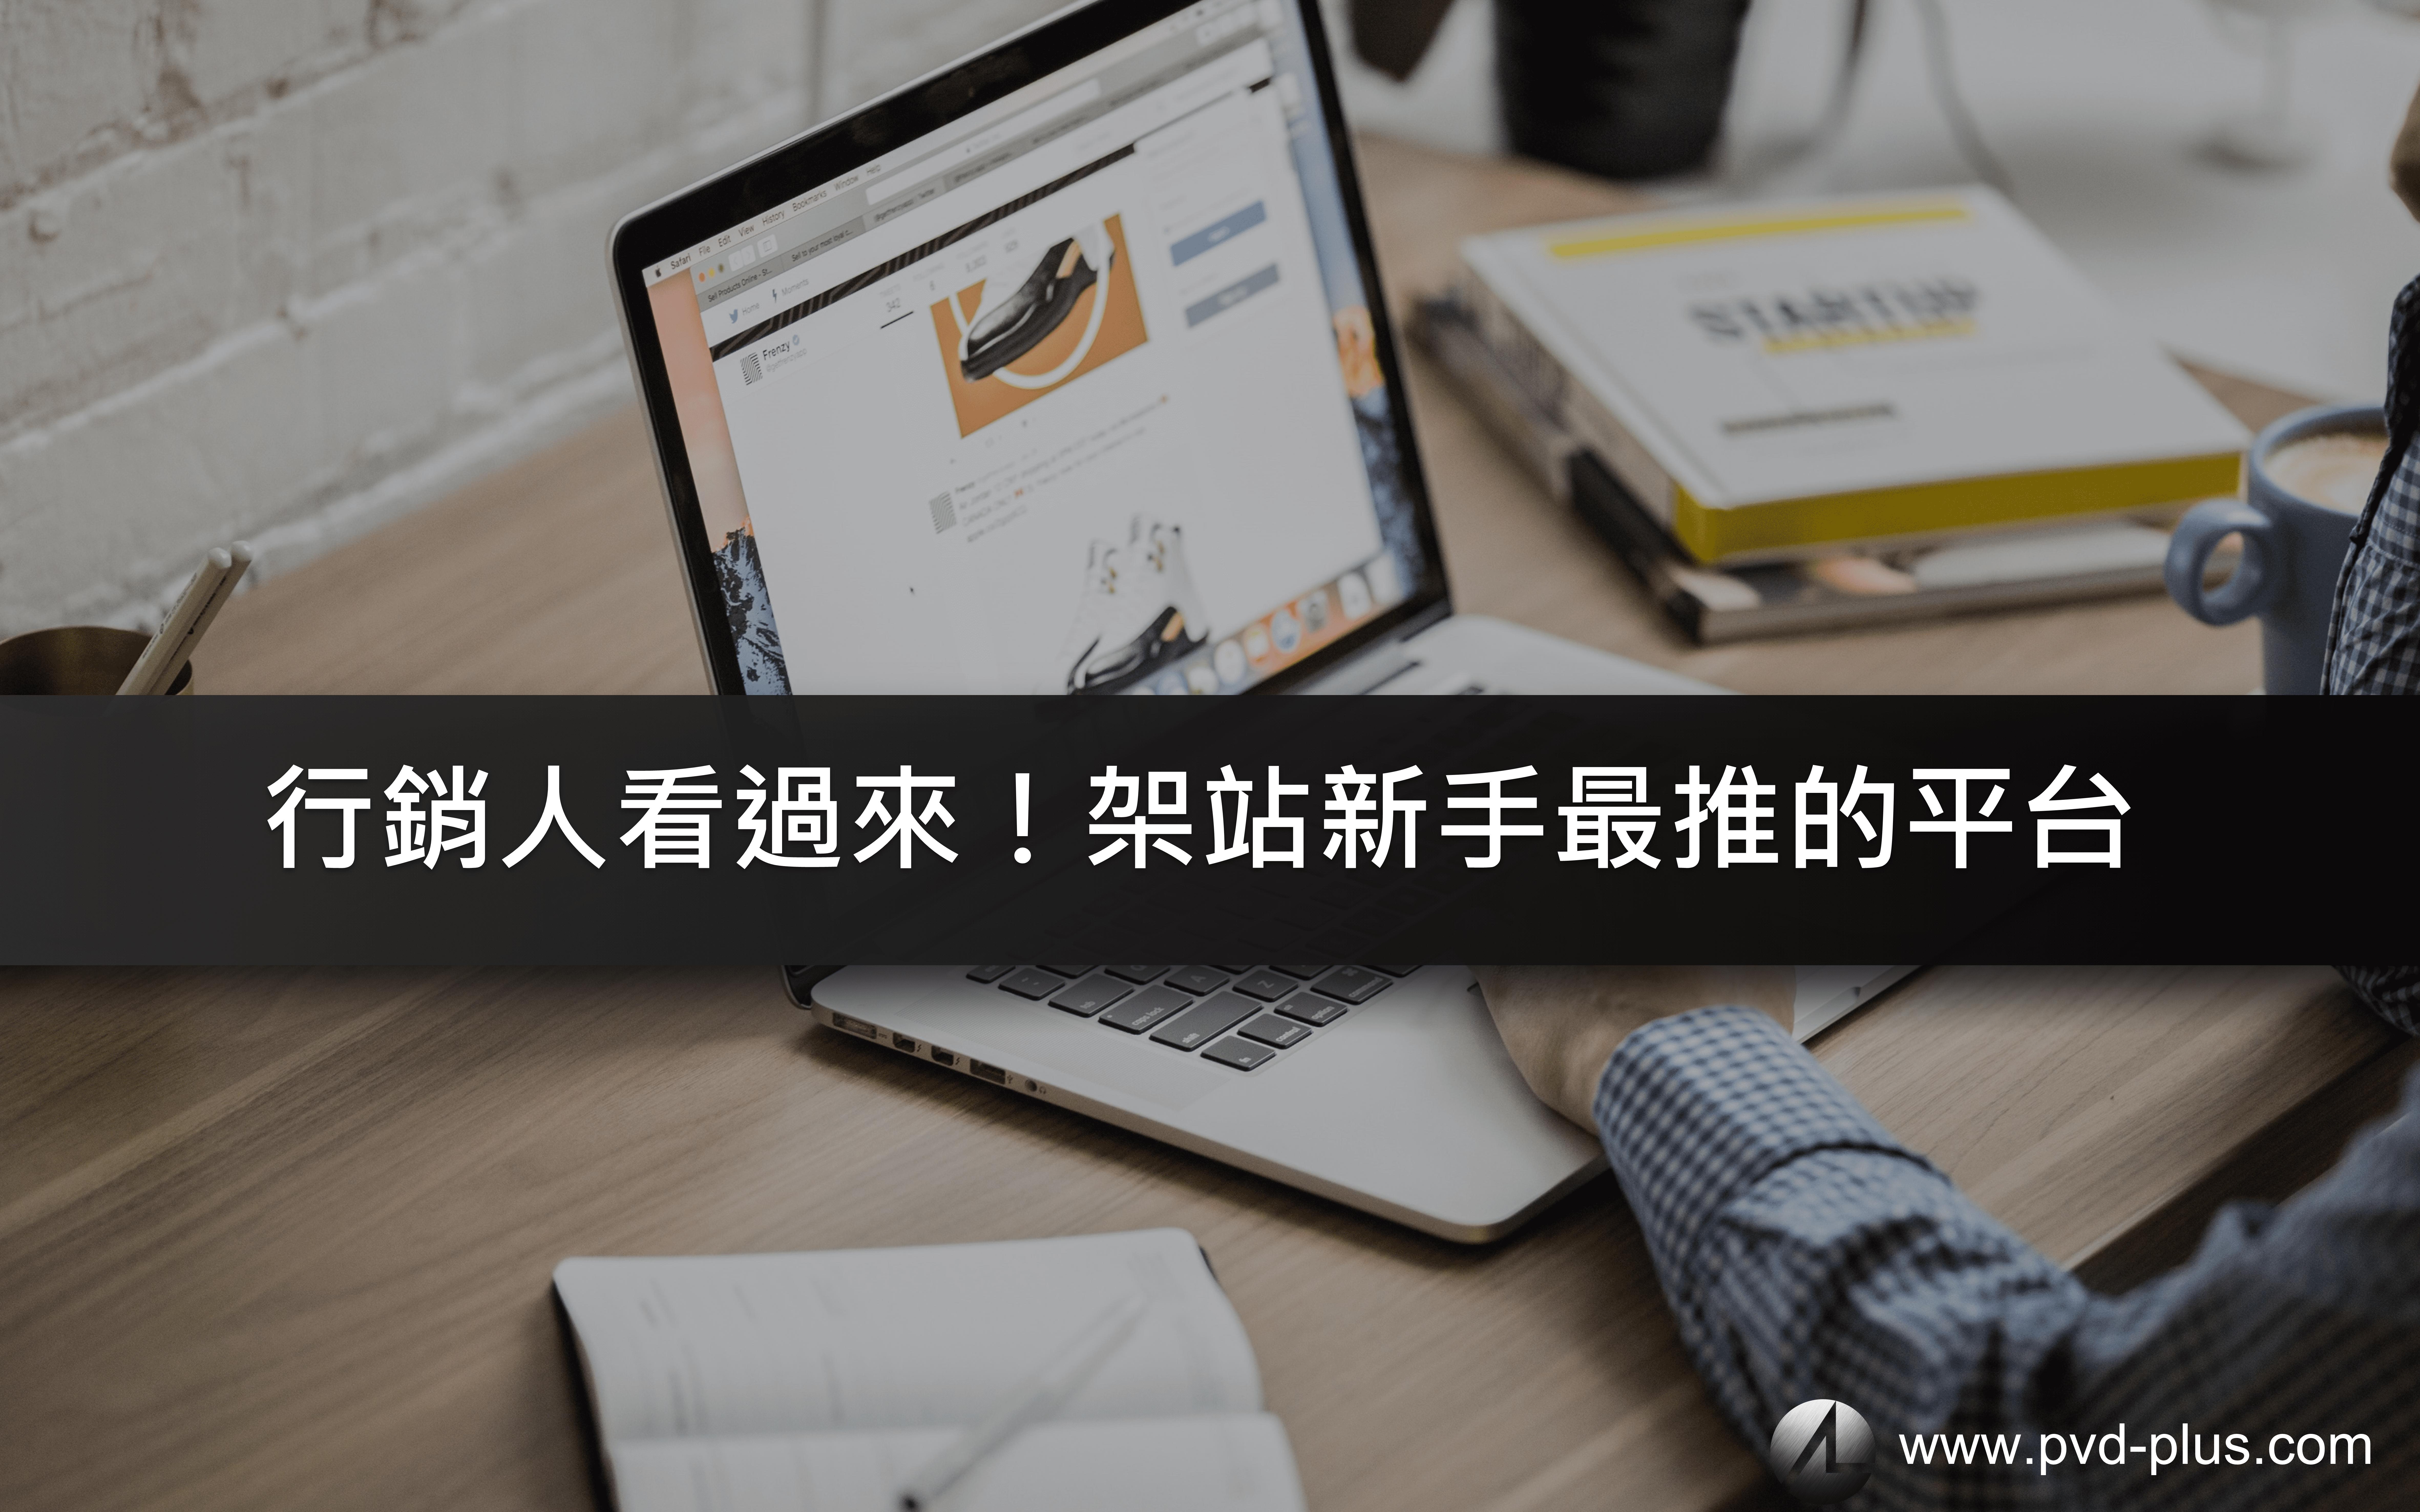 Strikingly 架設網站平台教學!4 個不可不知的功能,第3個超方便!